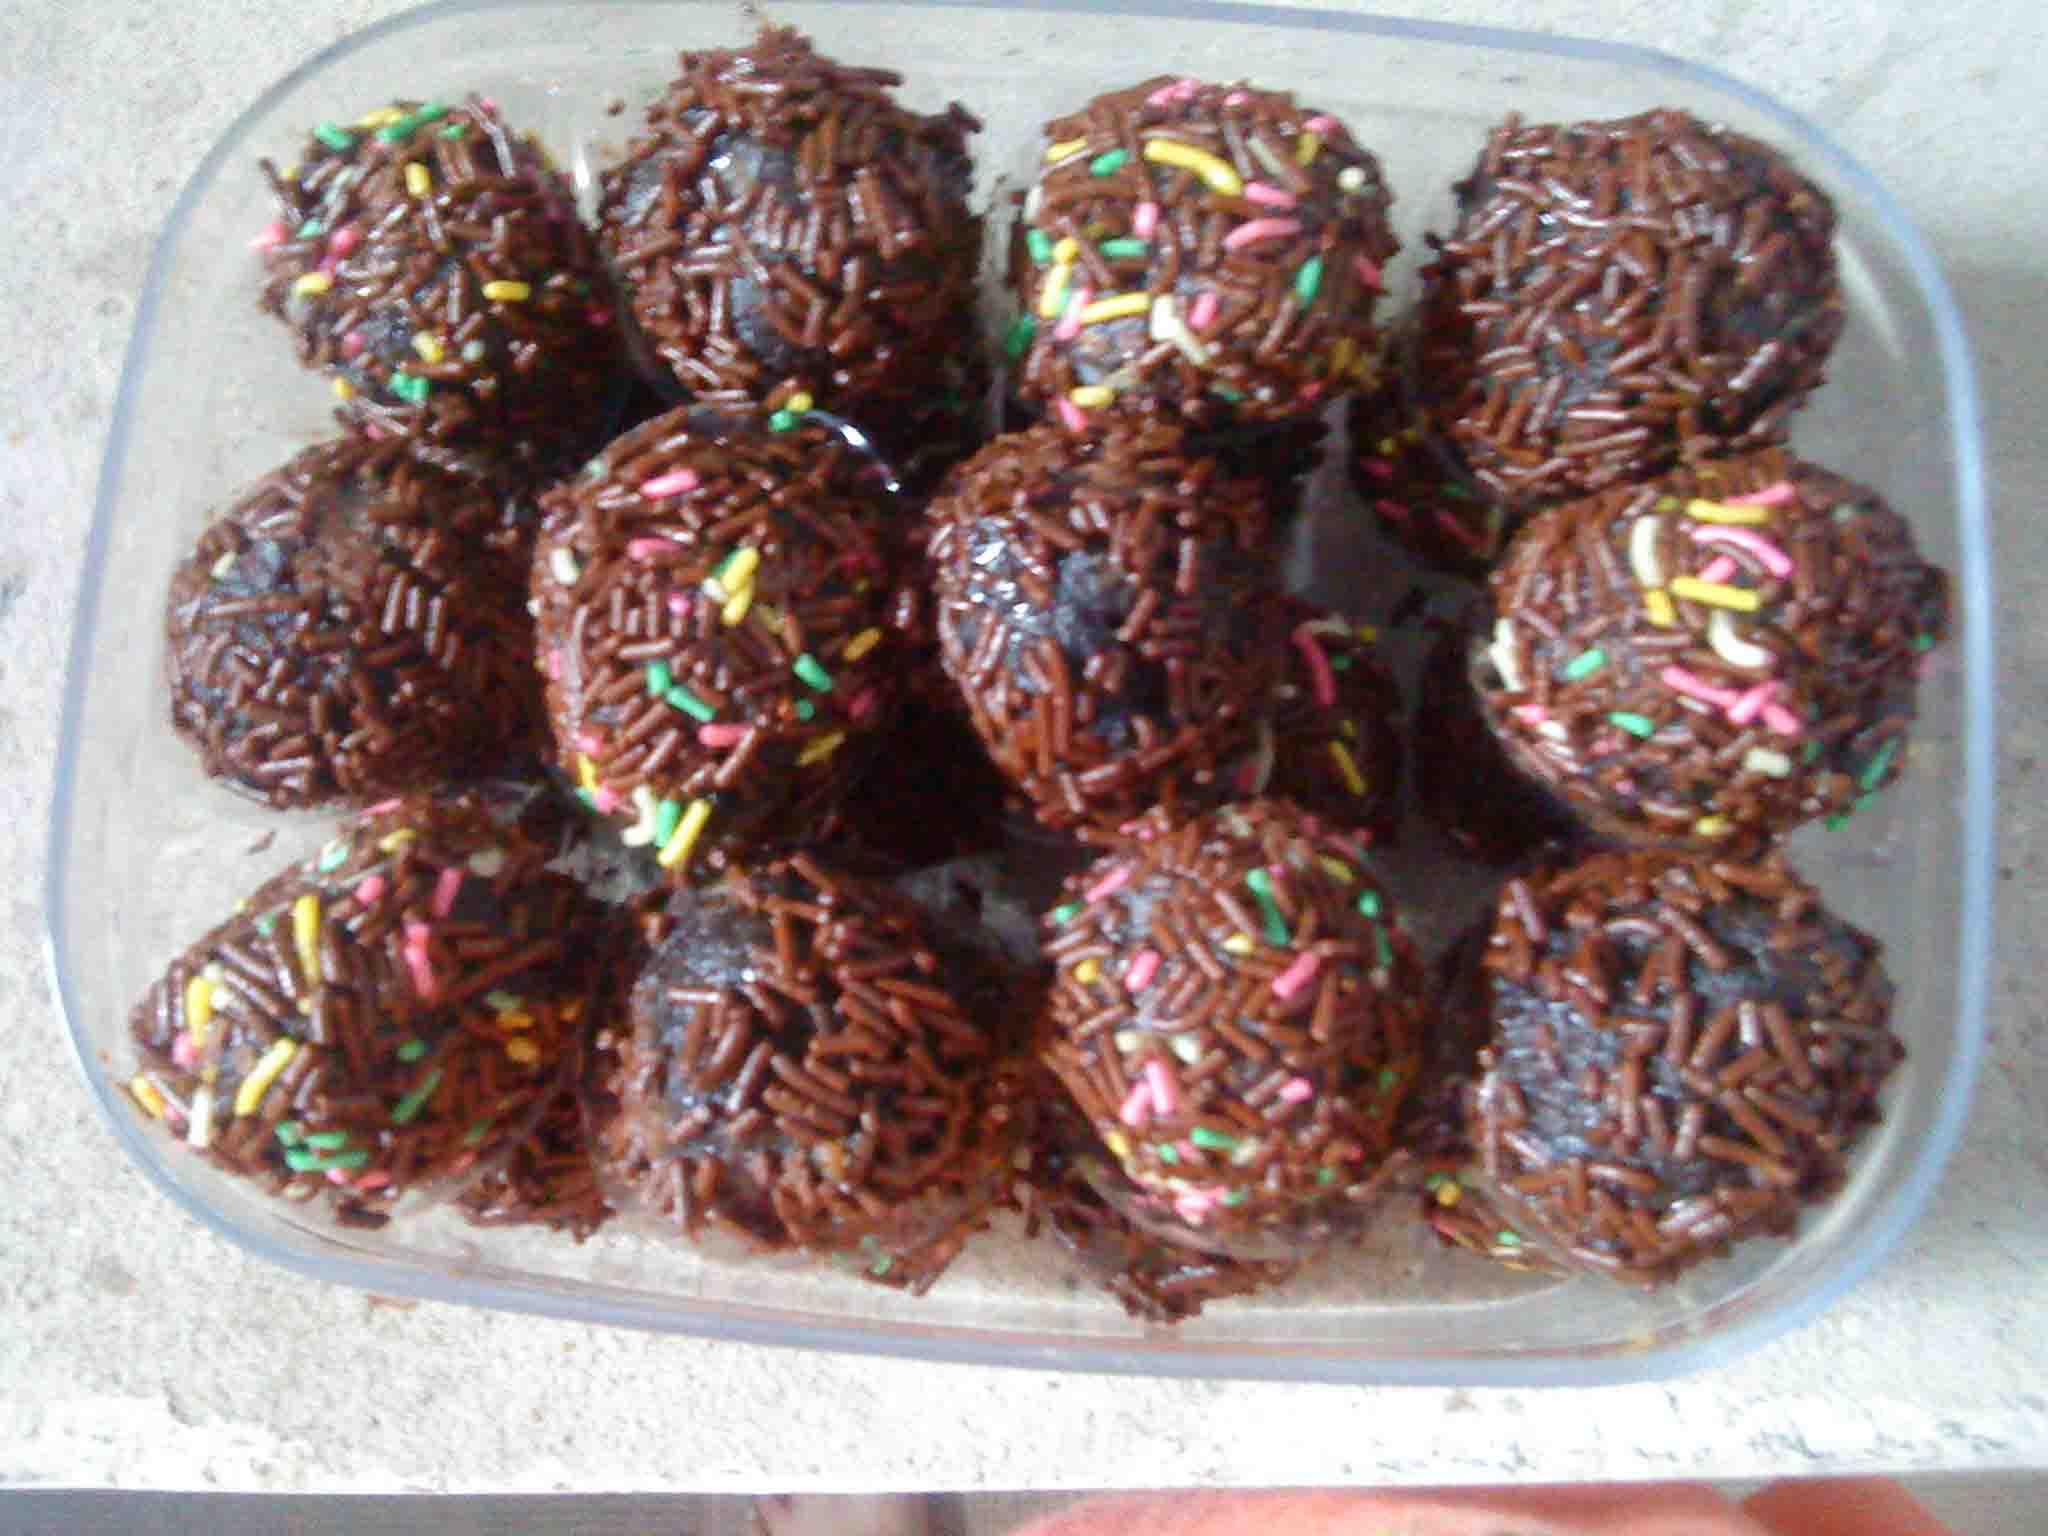 Chocolate Truffle Oreo | Resep Chocolate Truffle | Bola-bola Coklat ...